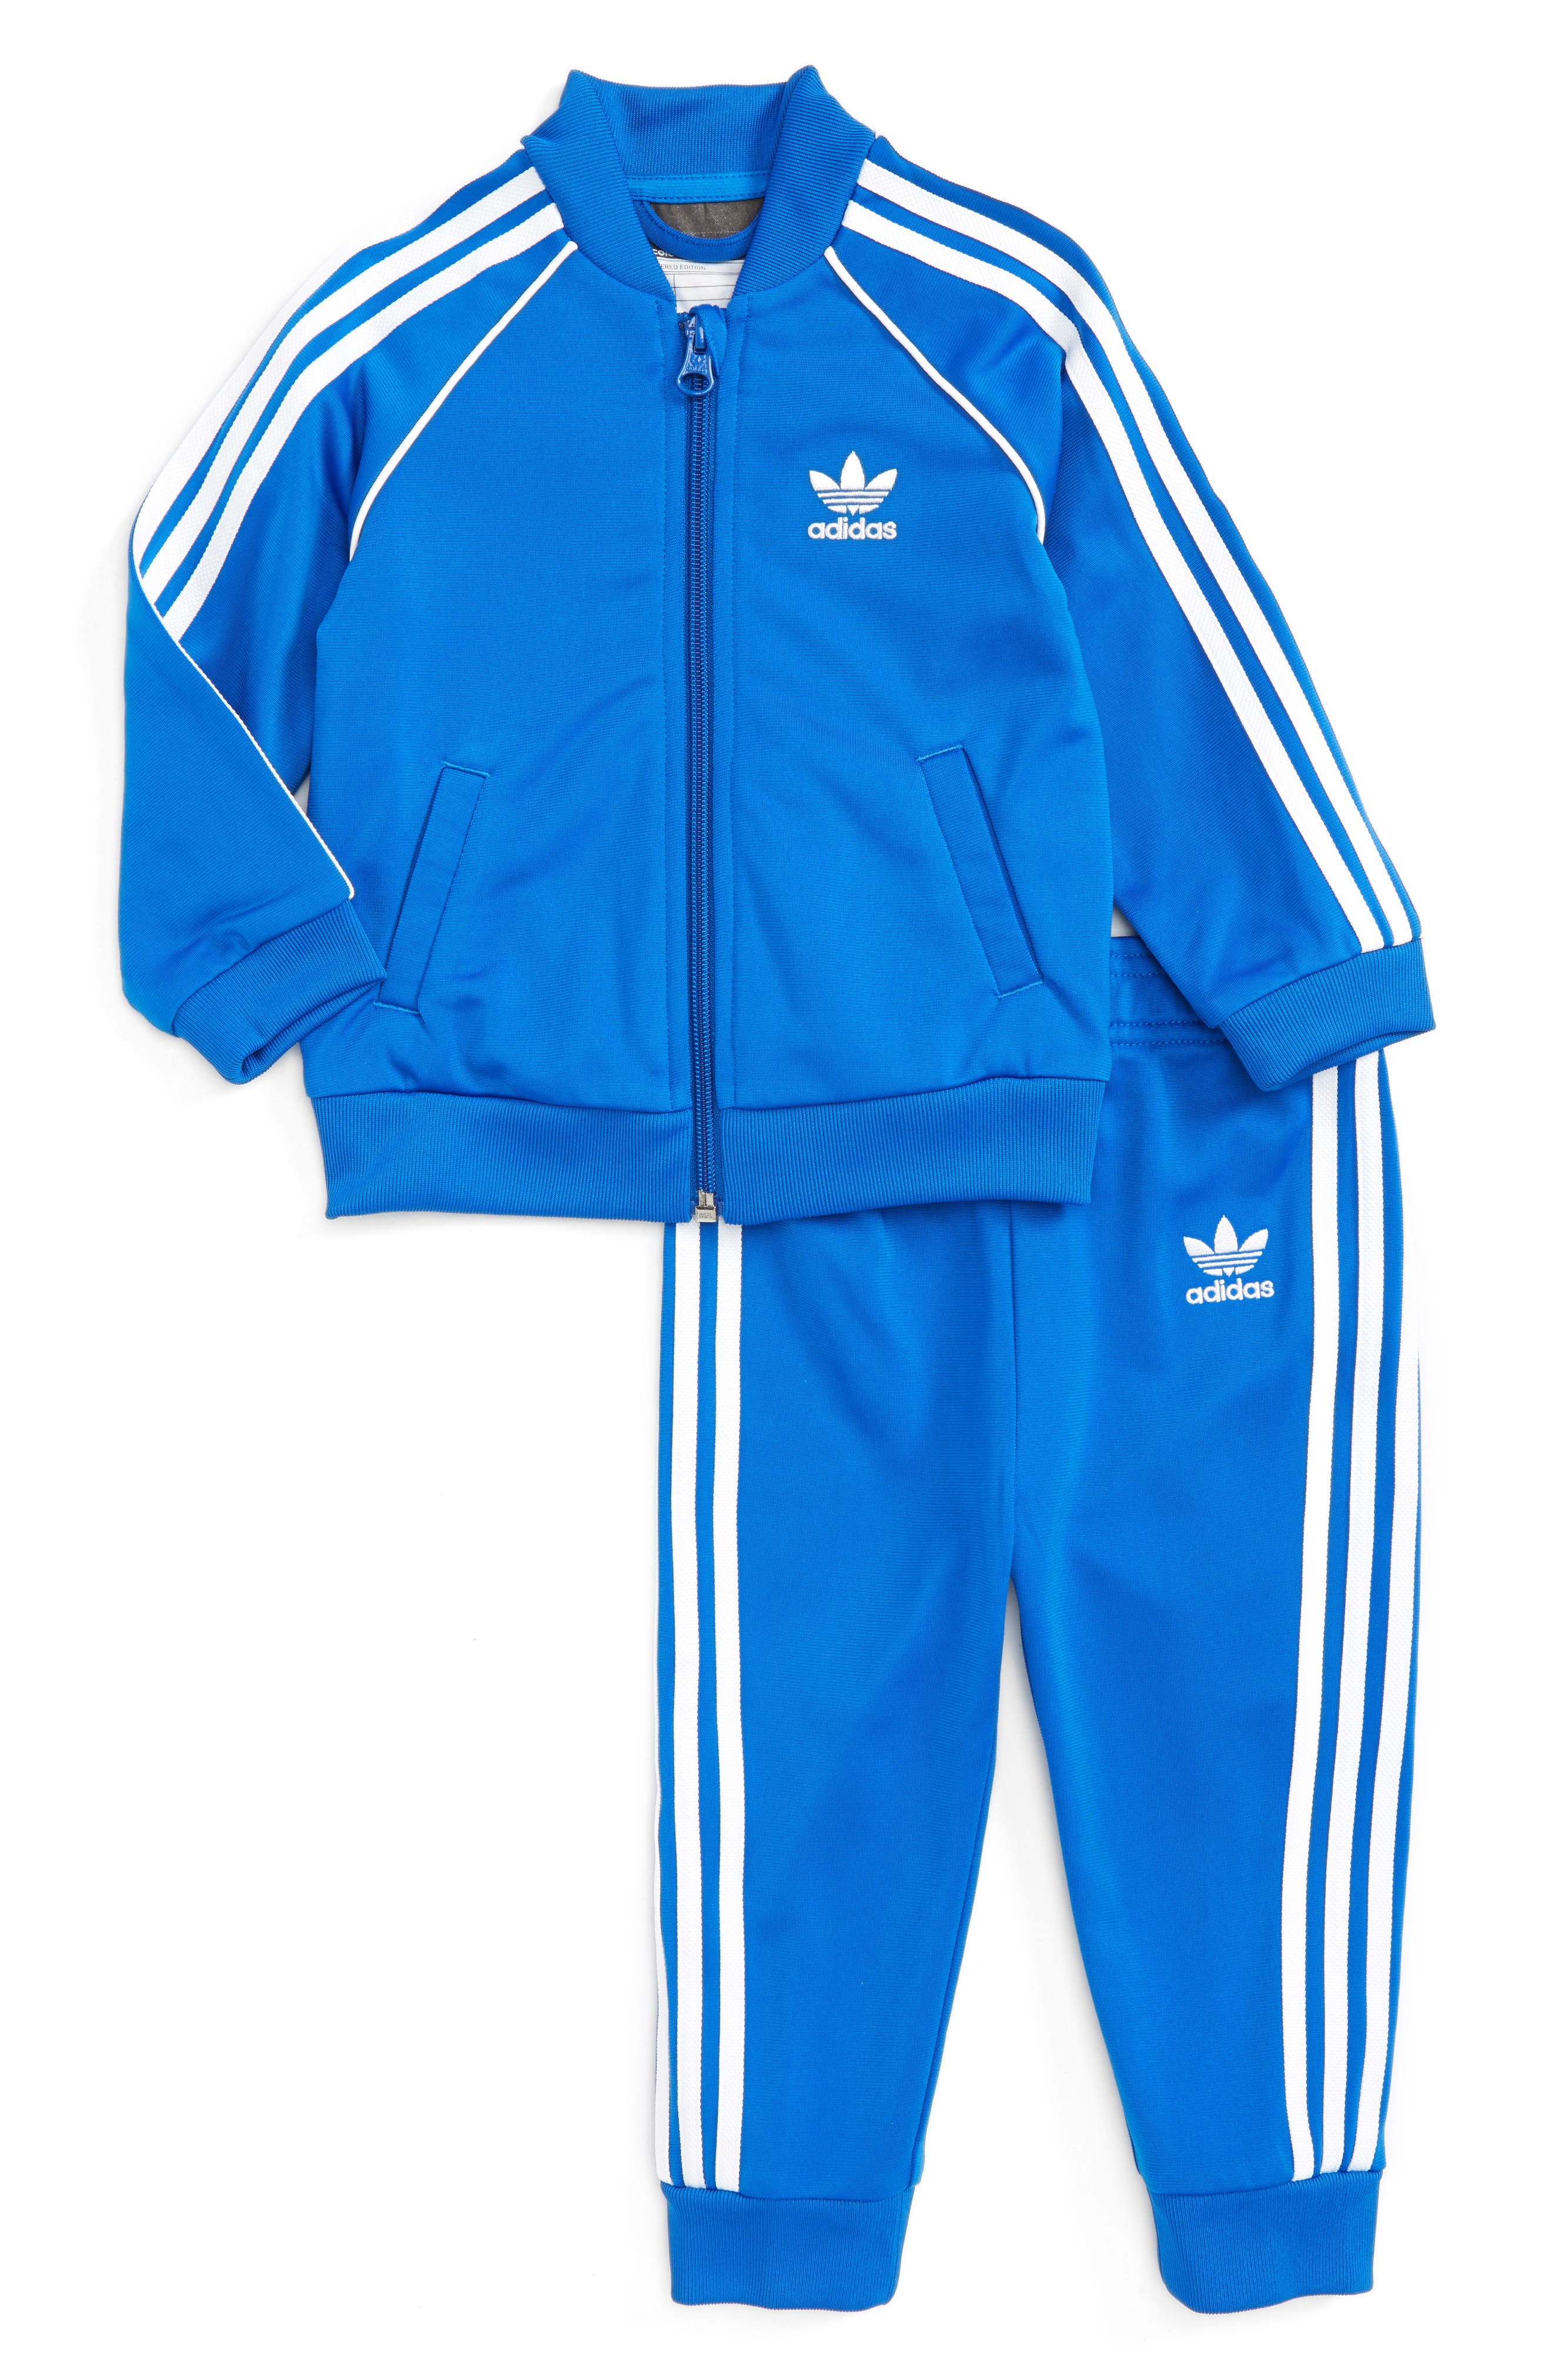 Main Image - adidas Originals Track Jacket & Athletic Pants Set (Baby Boys)